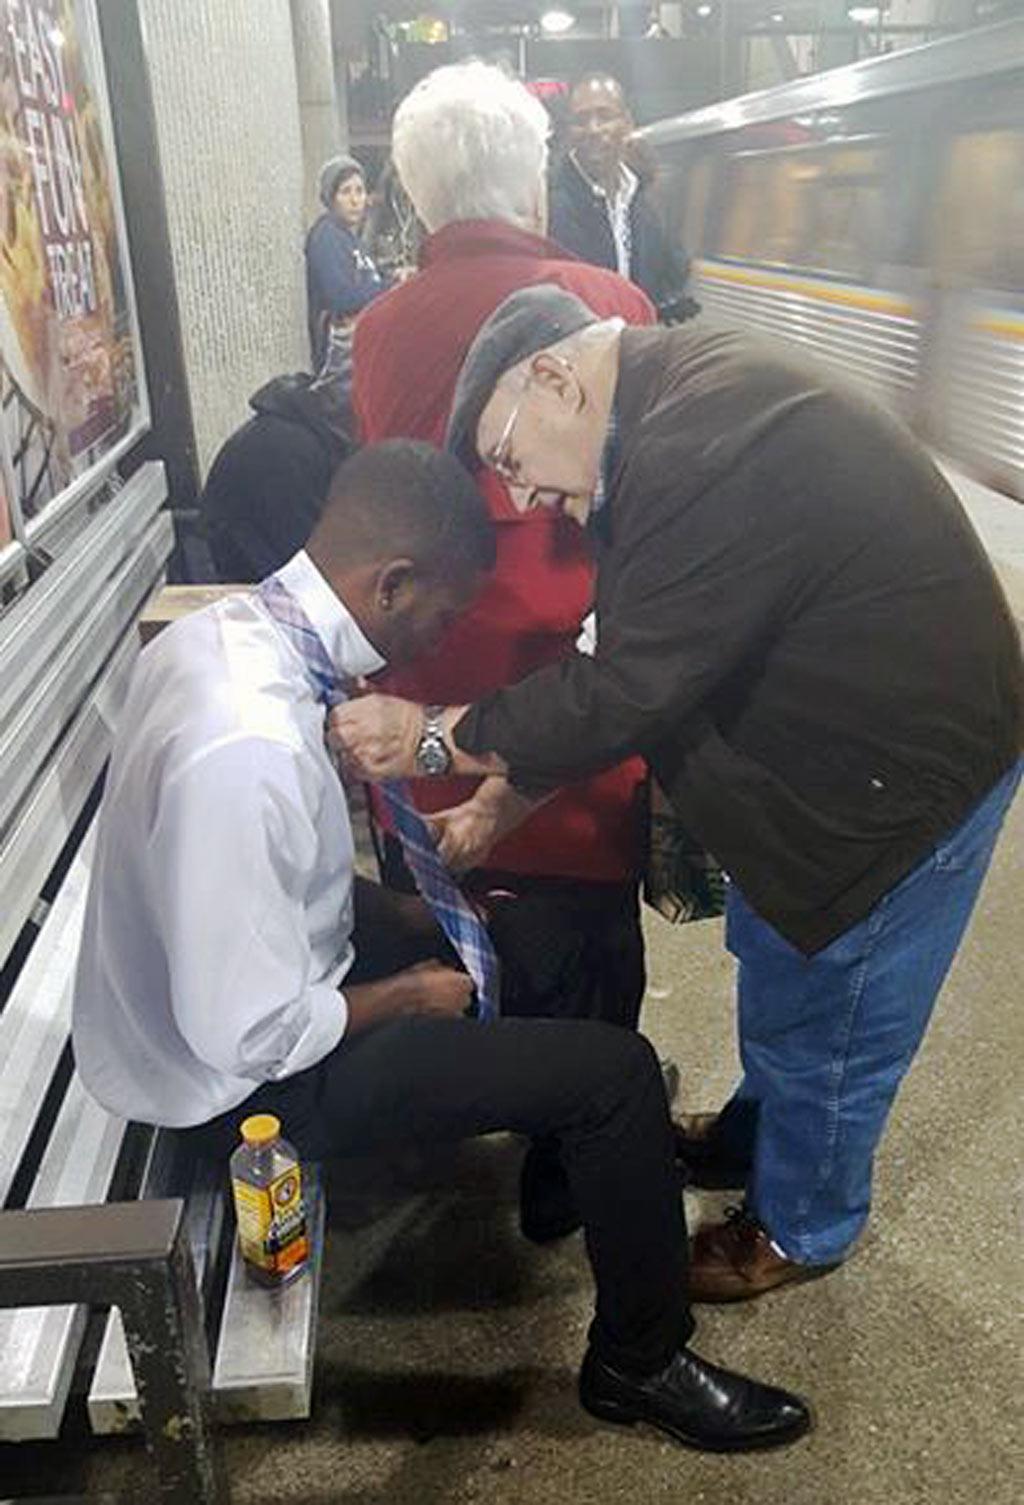 Viral photo shows elderly man teaching stranger how to tie a tie